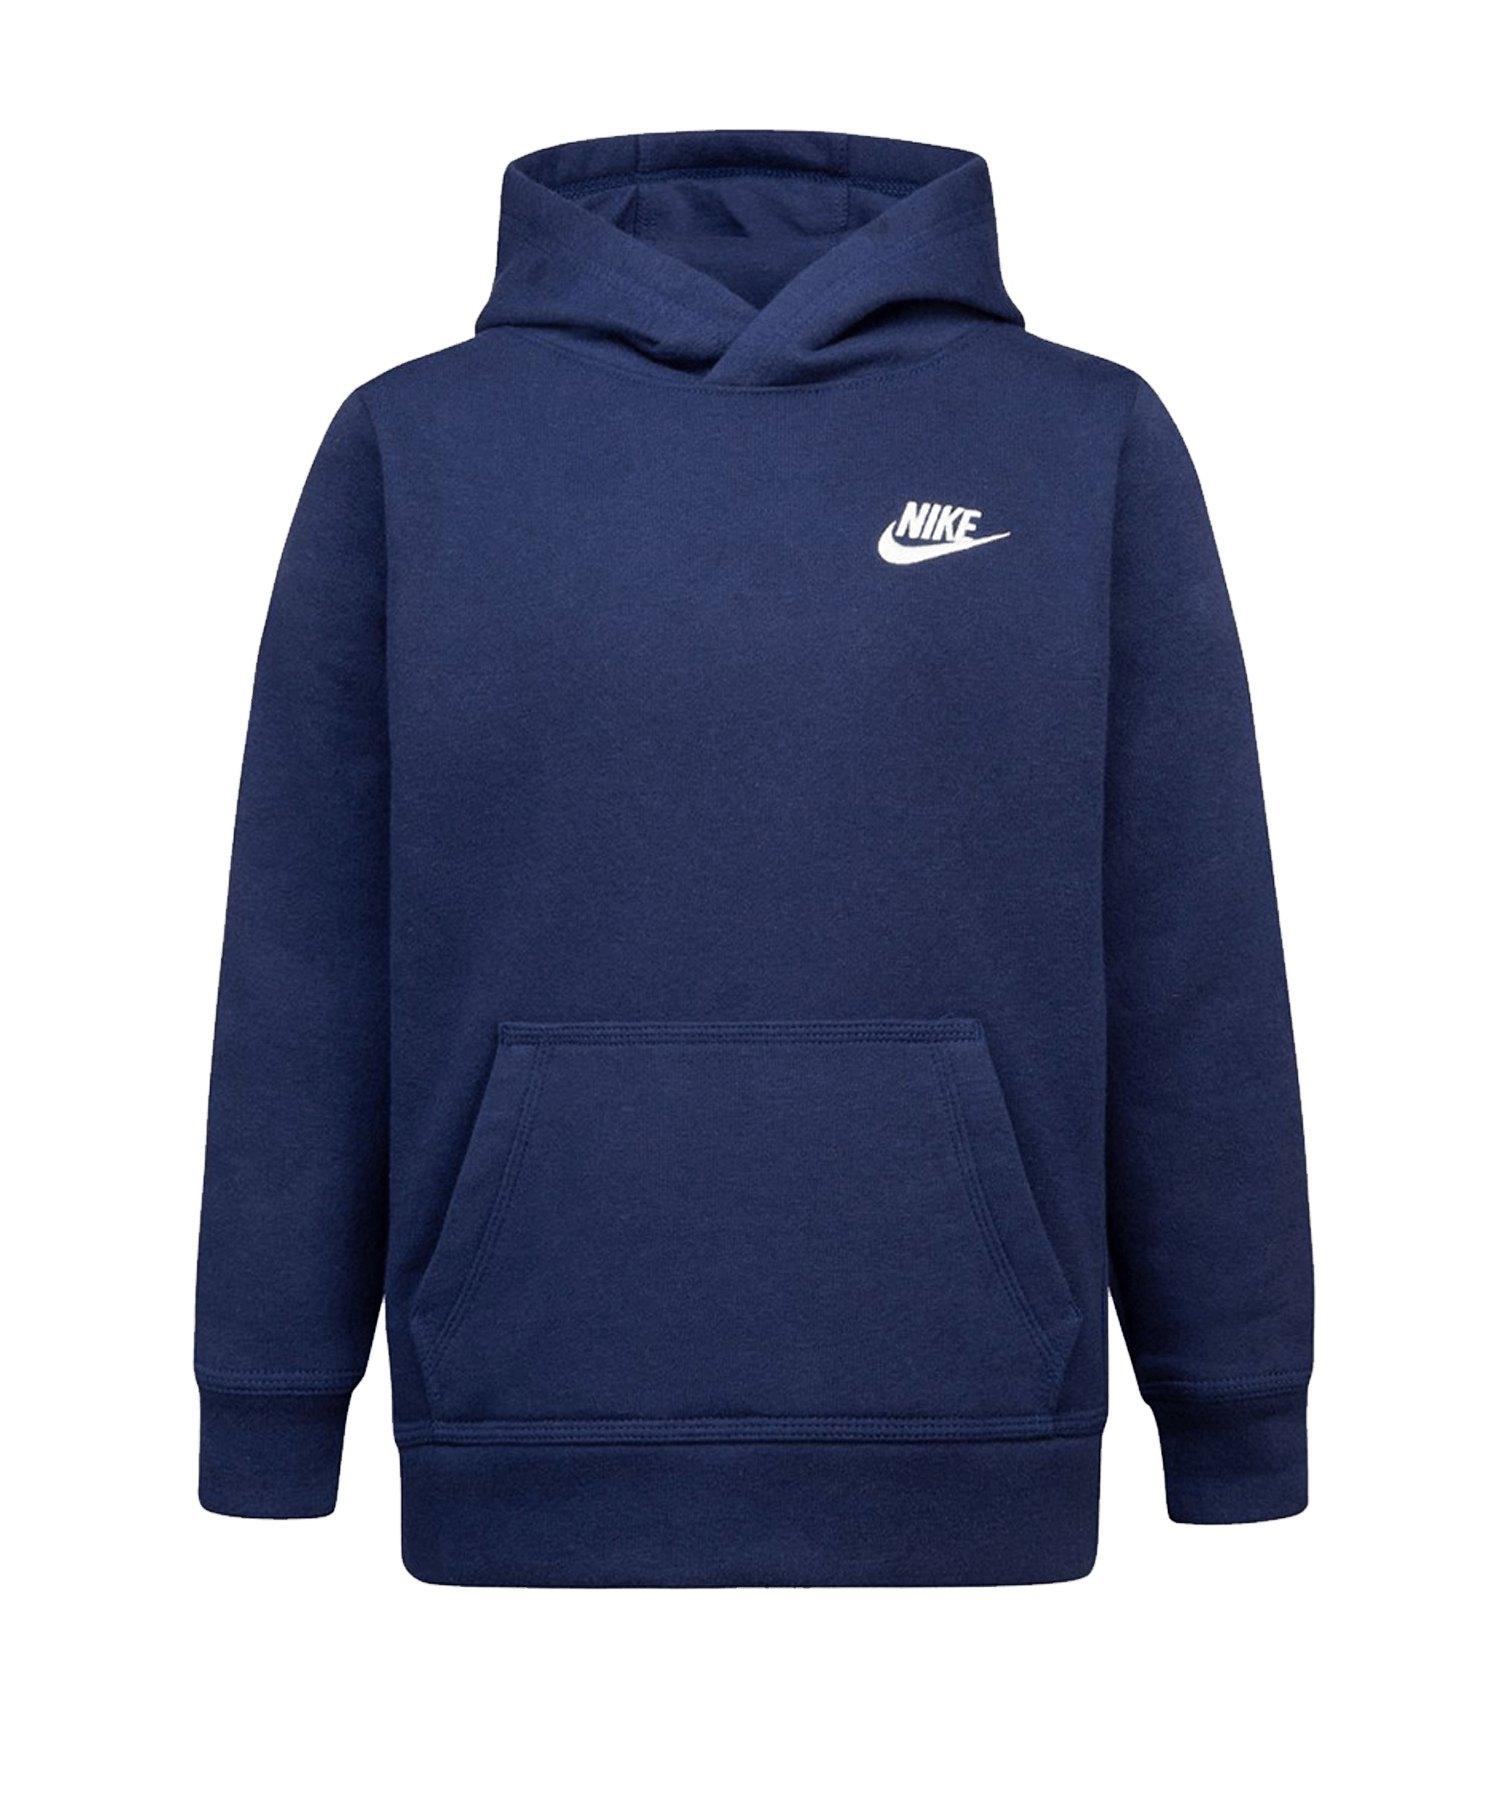 Nike Club Fleece Hoody Kids Blau FU90 - blau